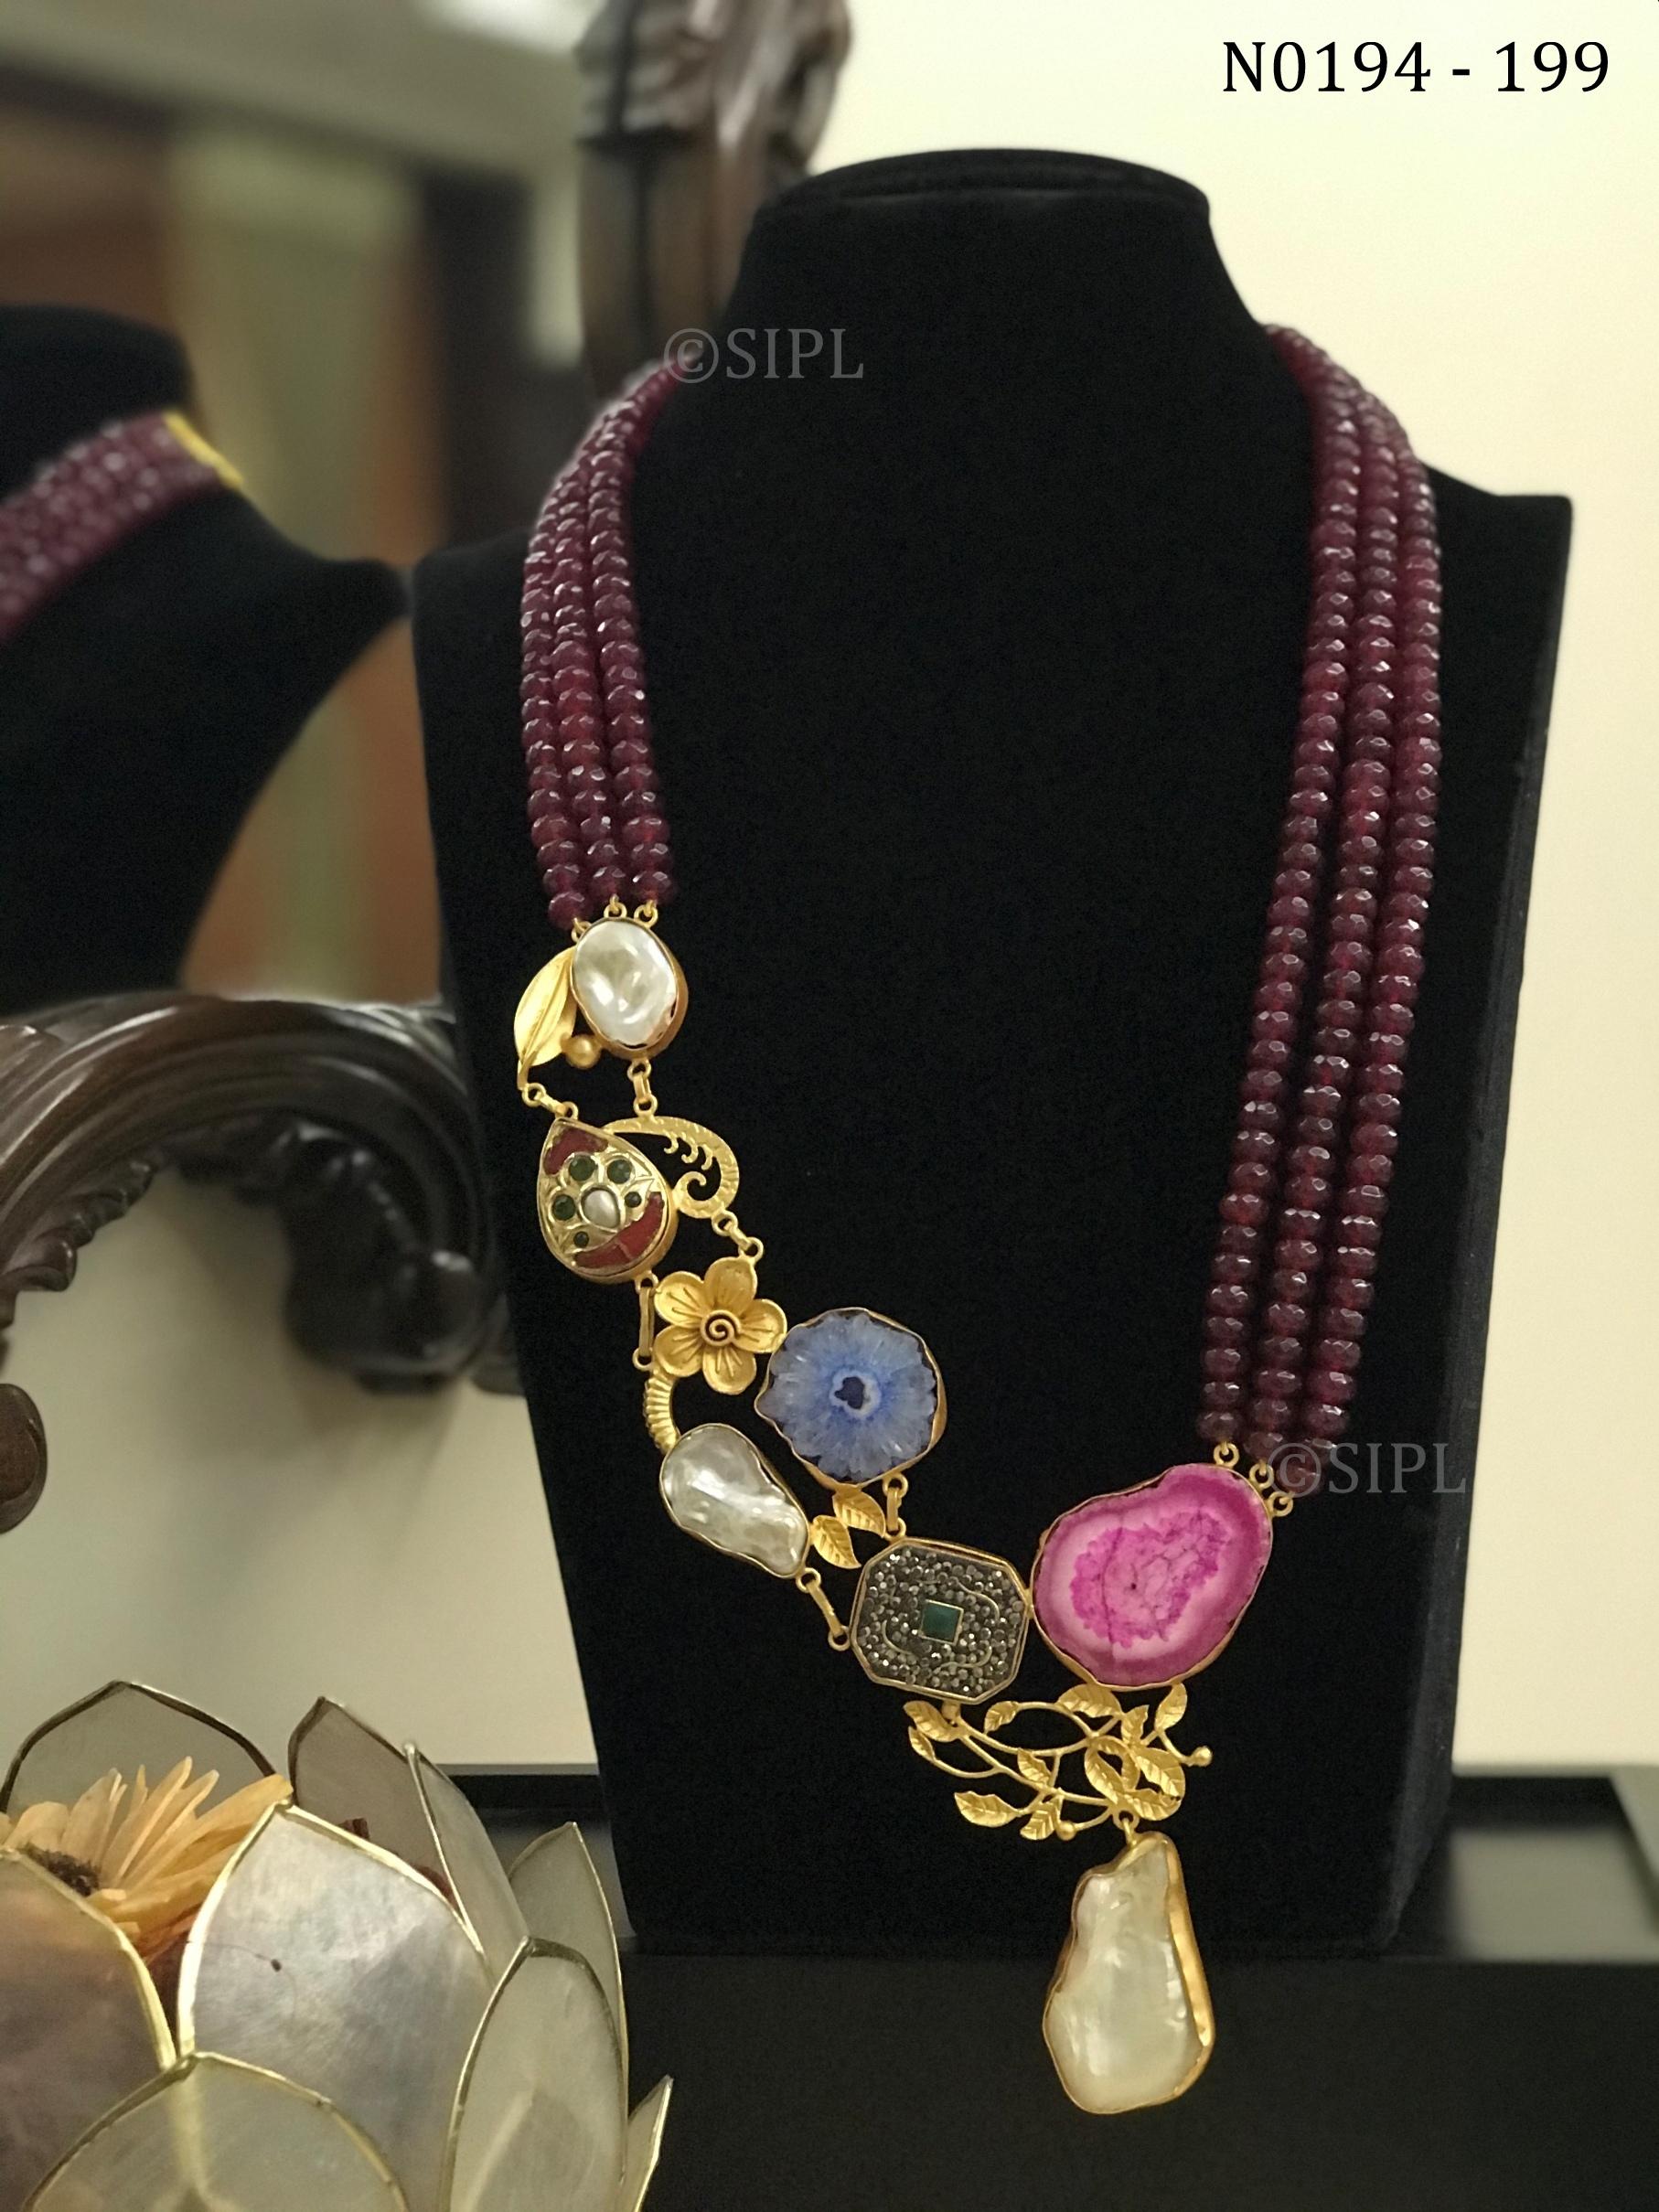 Contemporary Handmade Necklace in Natural Baroque